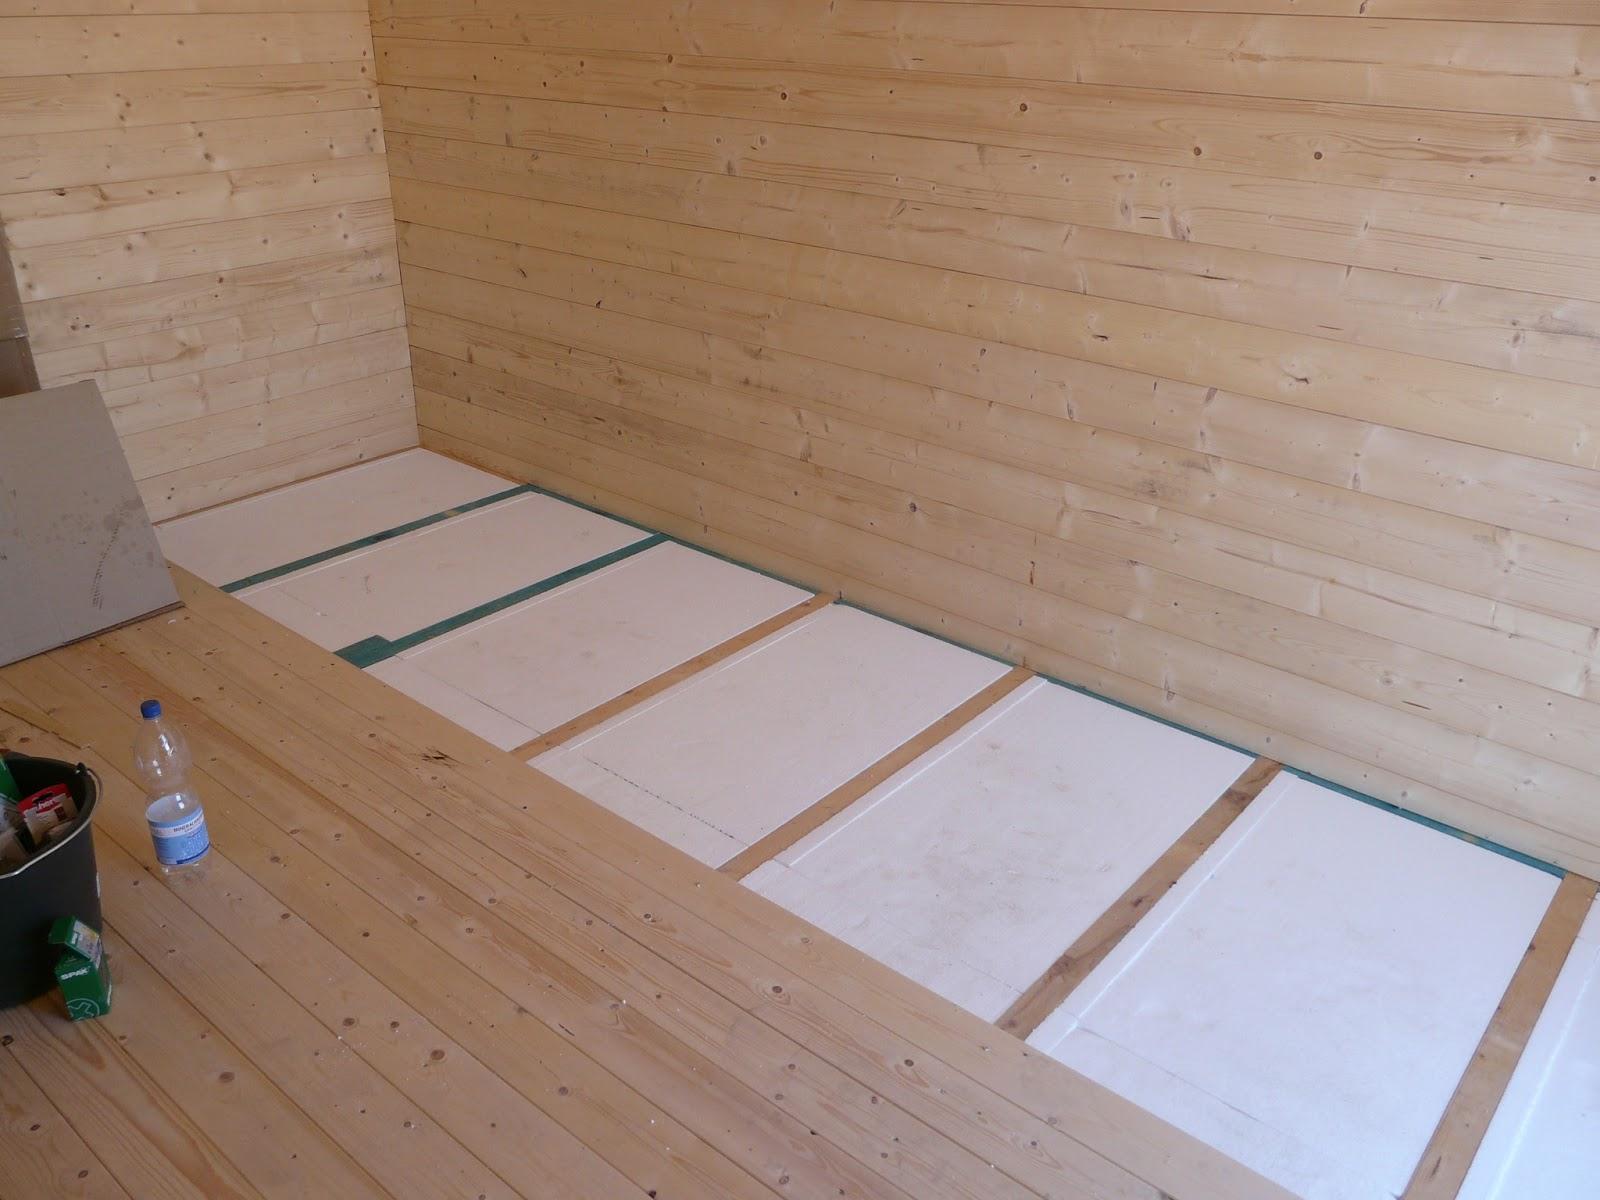 bodenplatte gartenhaus d mmen my blog. Black Bedroom Furniture Sets. Home Design Ideas